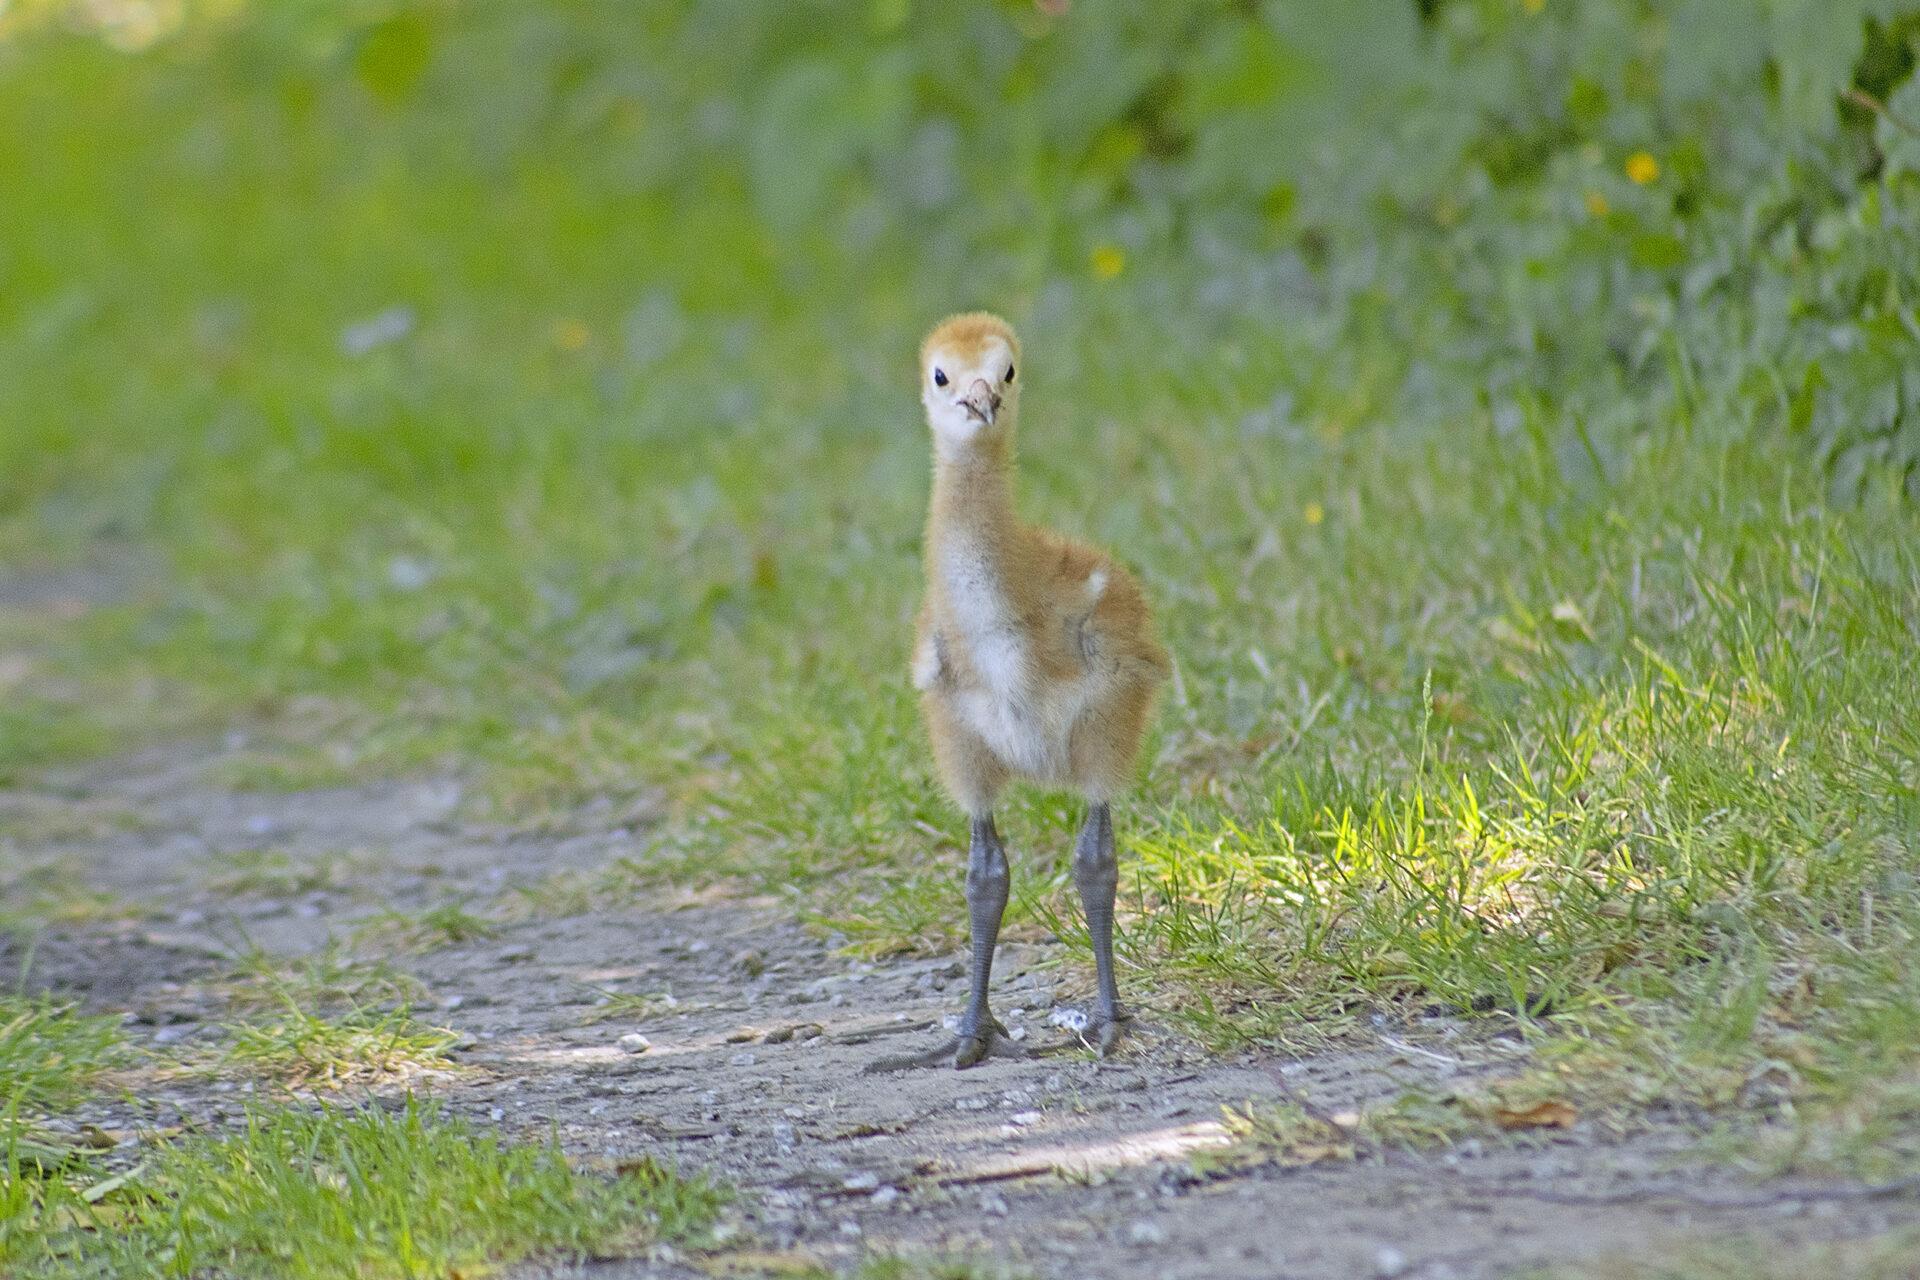 Sandhill Crane Colt at the Reifel Bird Sanctuary, July 2, 2021